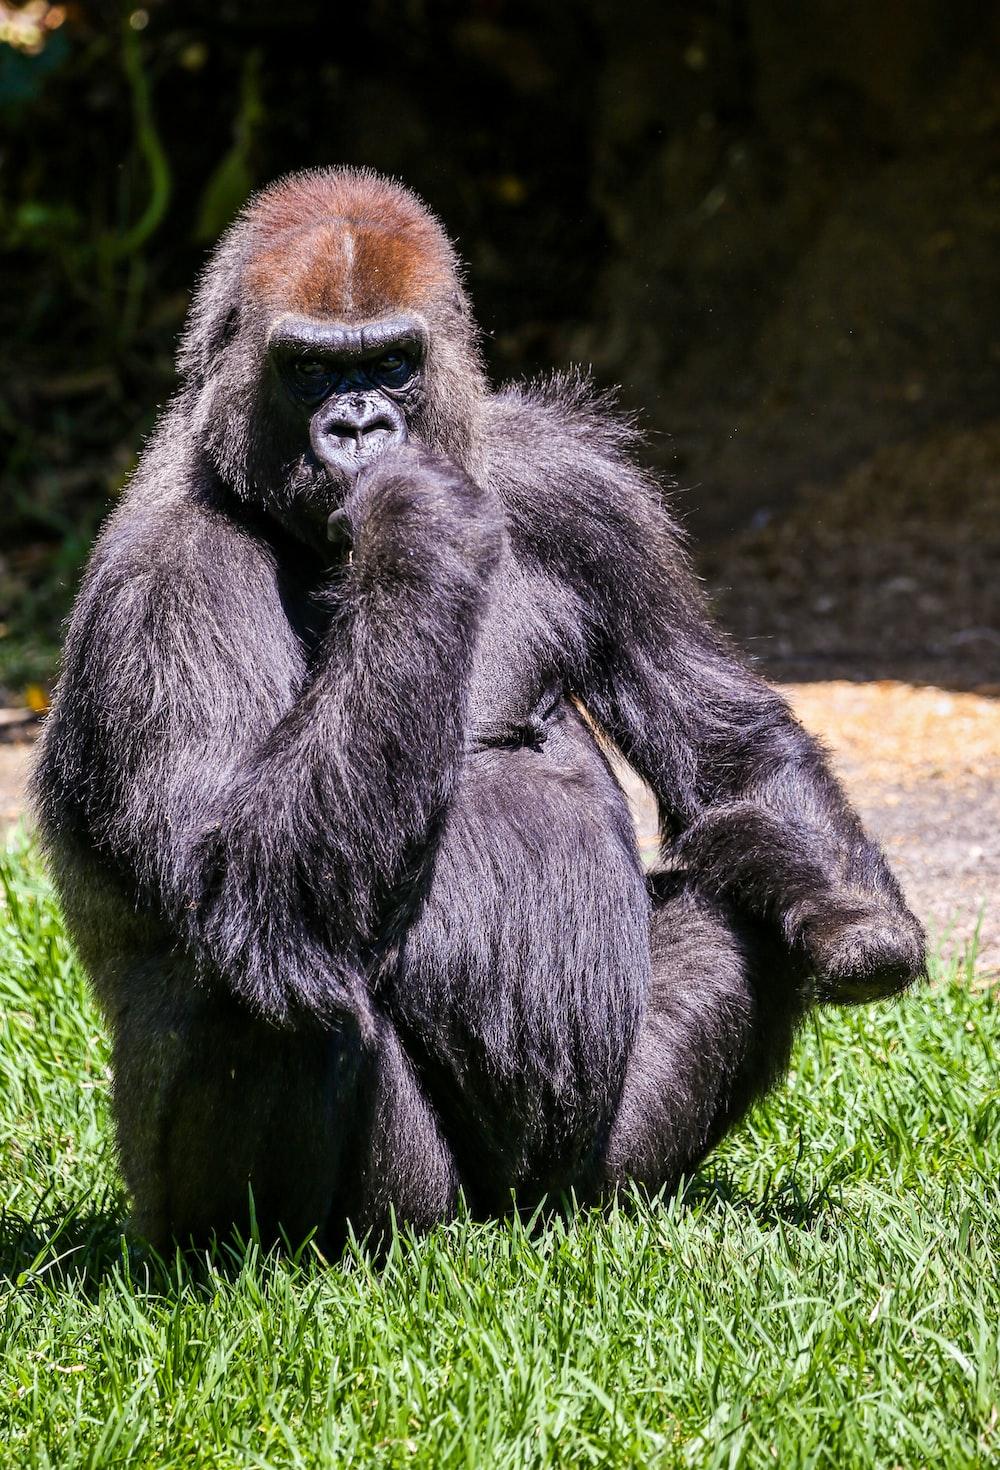 black gorilla sitting on ground during daytime